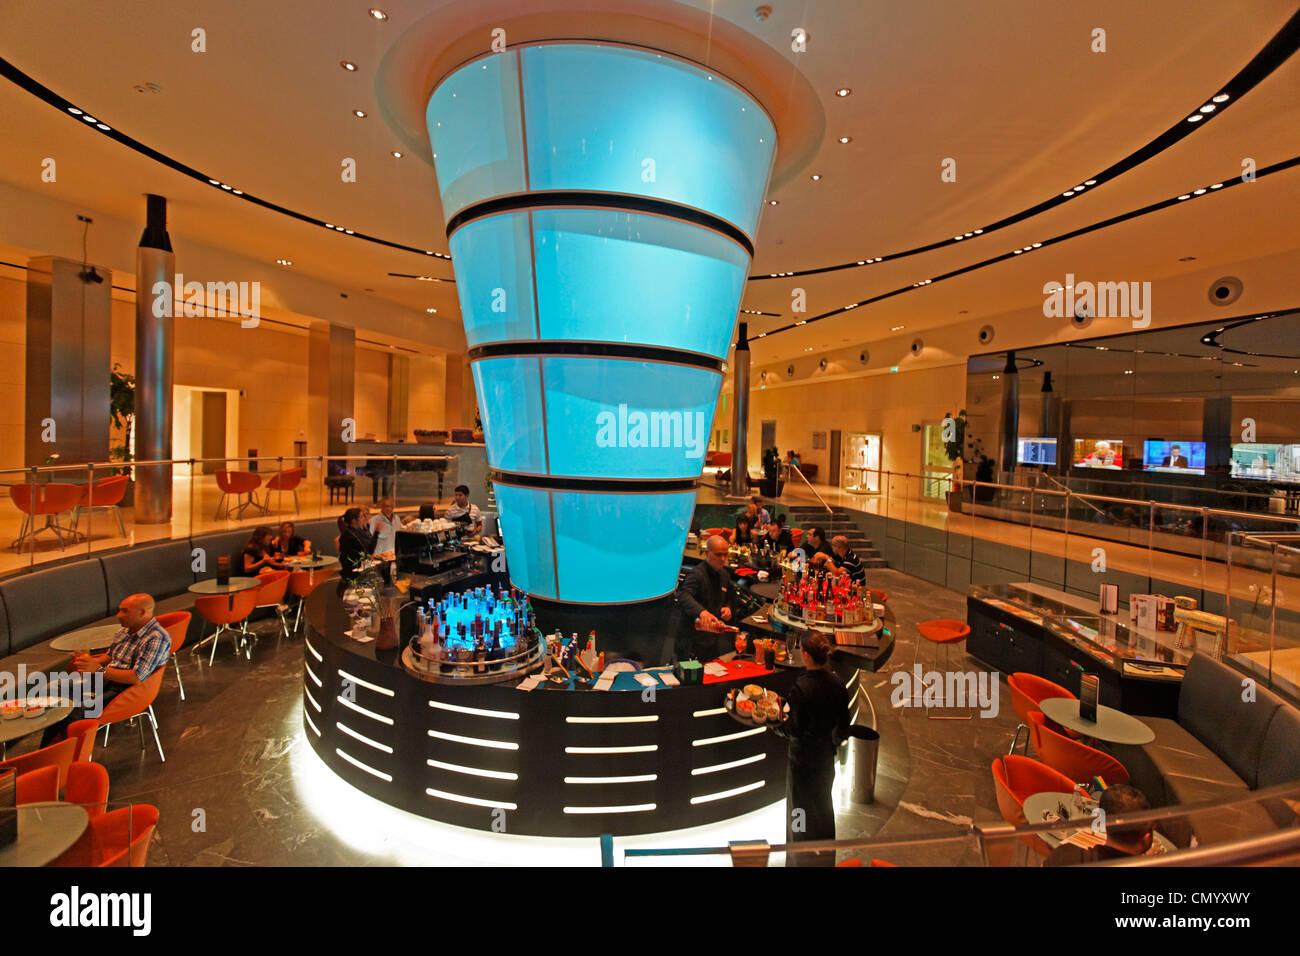 T hotel, Design Hotel Bar, Cagliari, Sardinia, Italy Stock ...